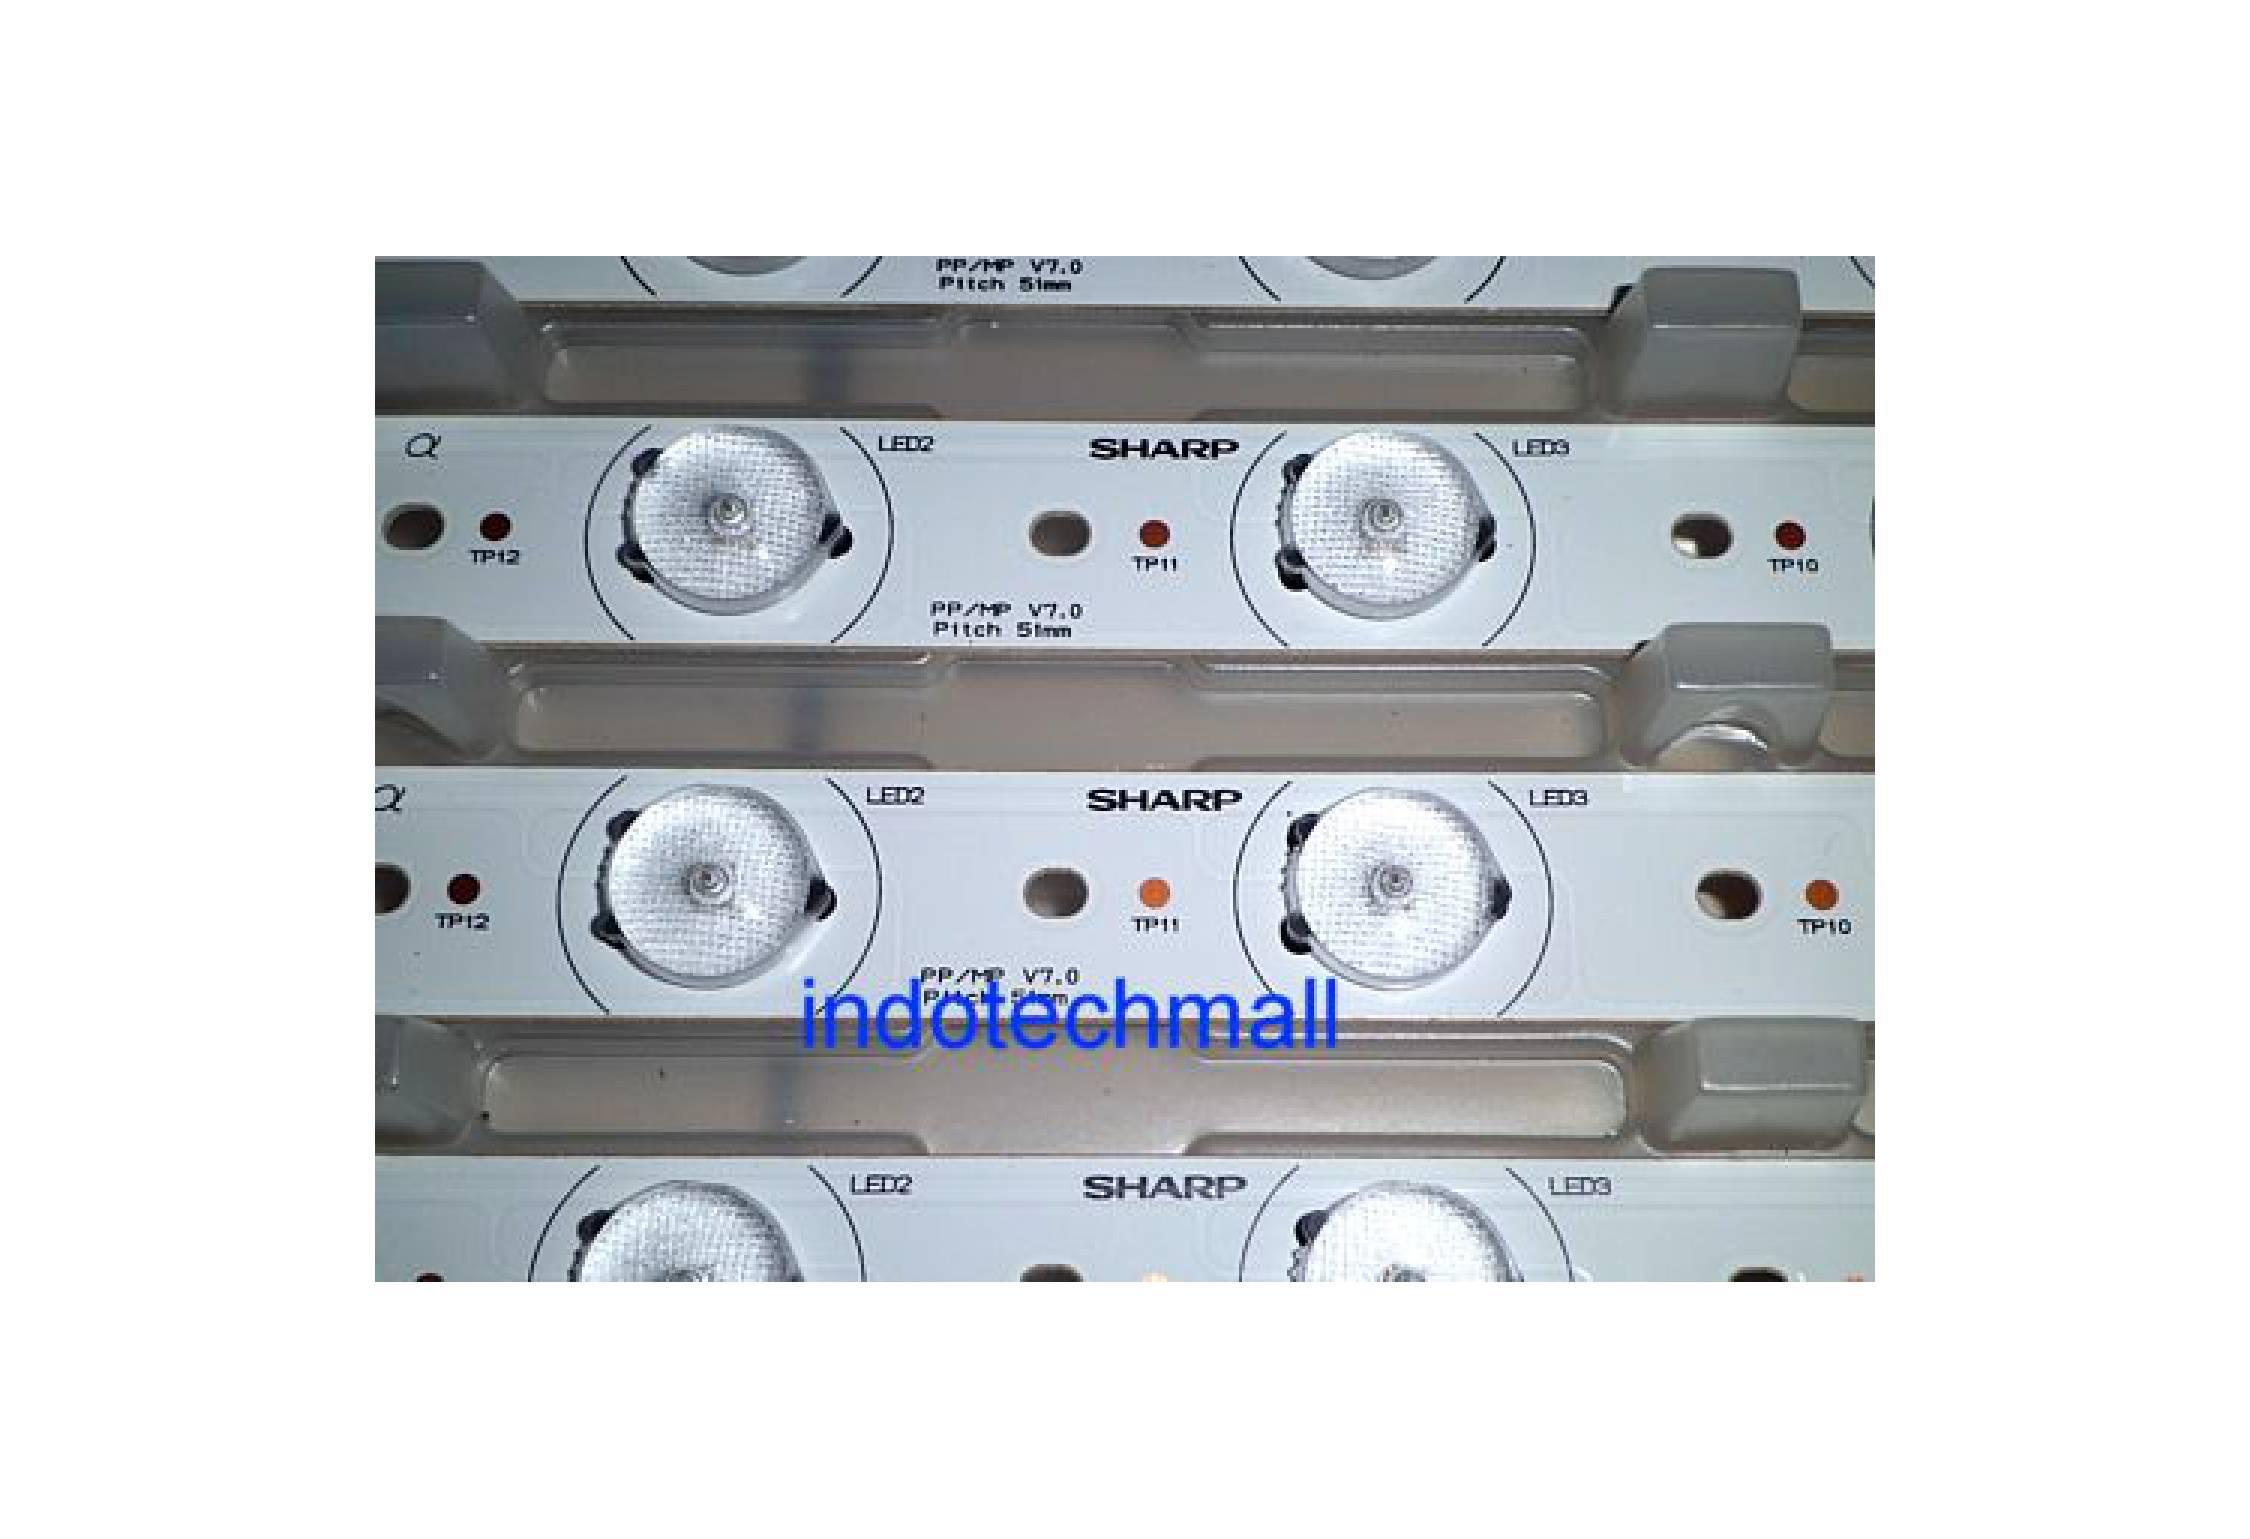 Kelebihan Paket Universal Power Board And Inverter Converter Led 2 Lampu Backlight Tv 380 Mm Monitor Lcd 10inch19 4014 600ma 12